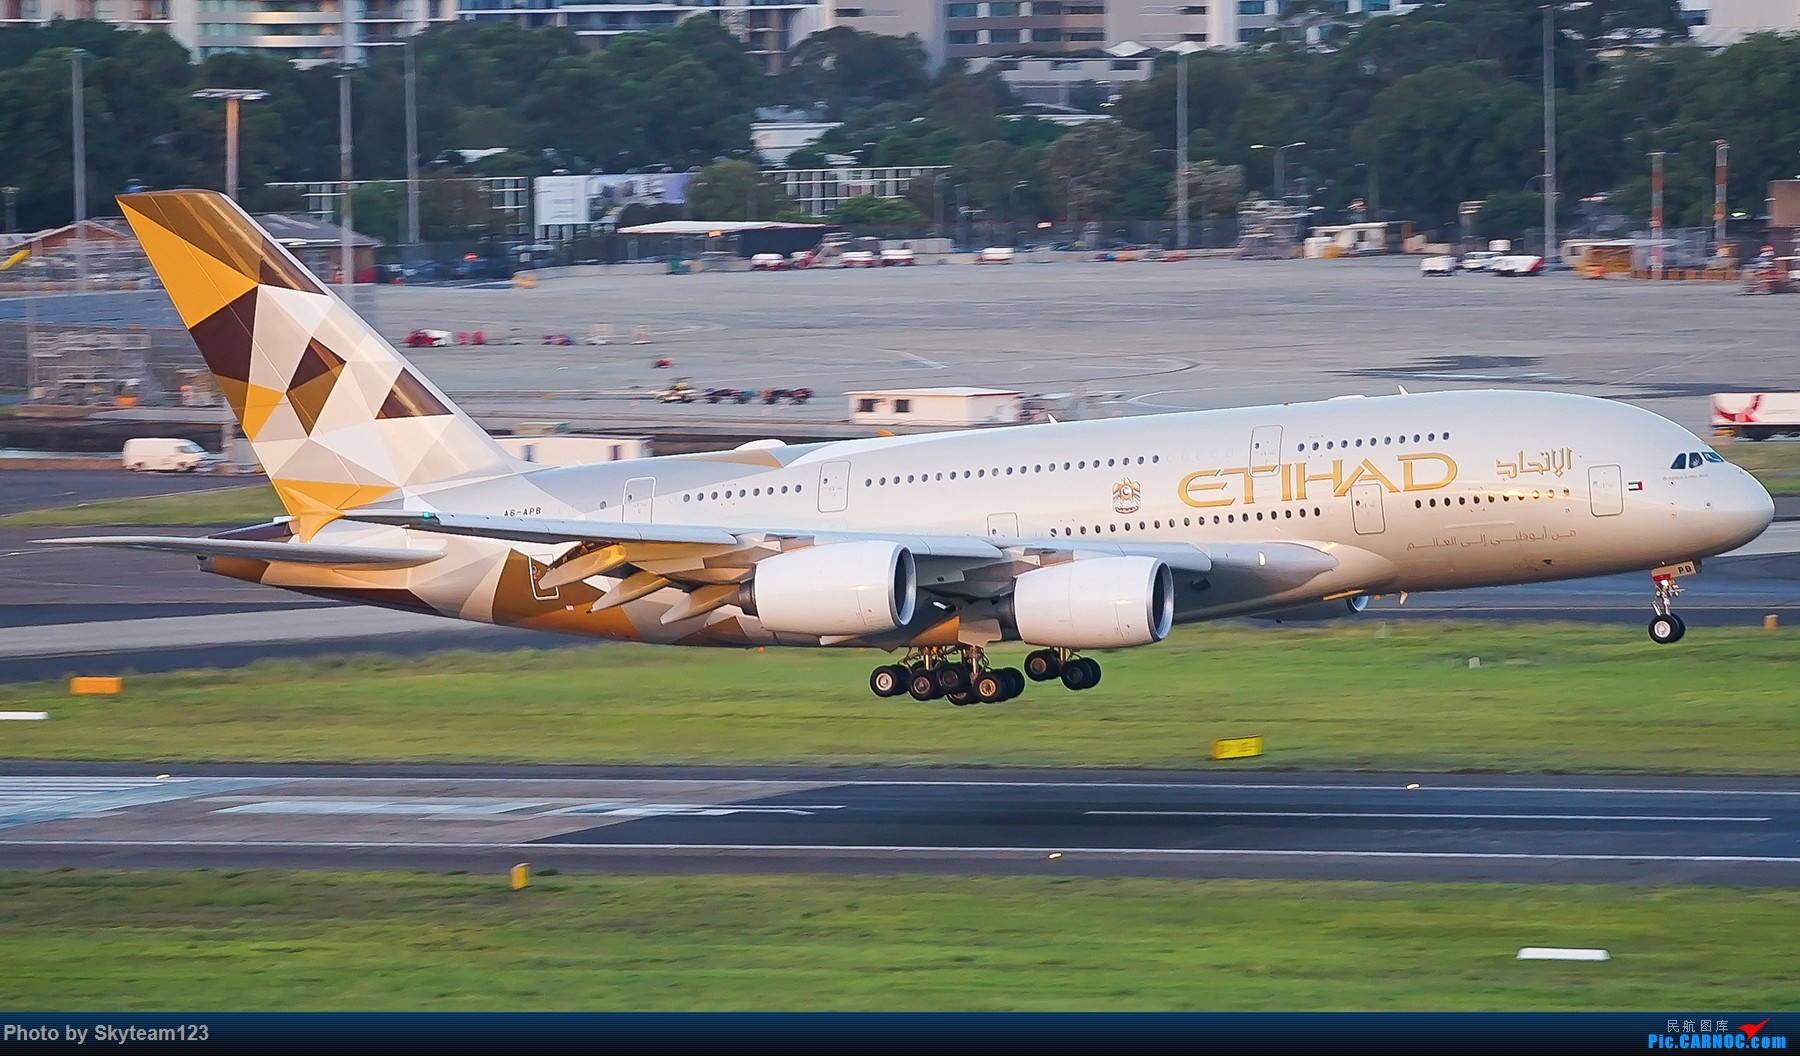 Re:[原创]【SYD】解锁T1国际航站旁停车场顶楼拍机位 下午16R抵达的好货们以及夜拍轨迹 AIRBUS A380-800 A6-APB